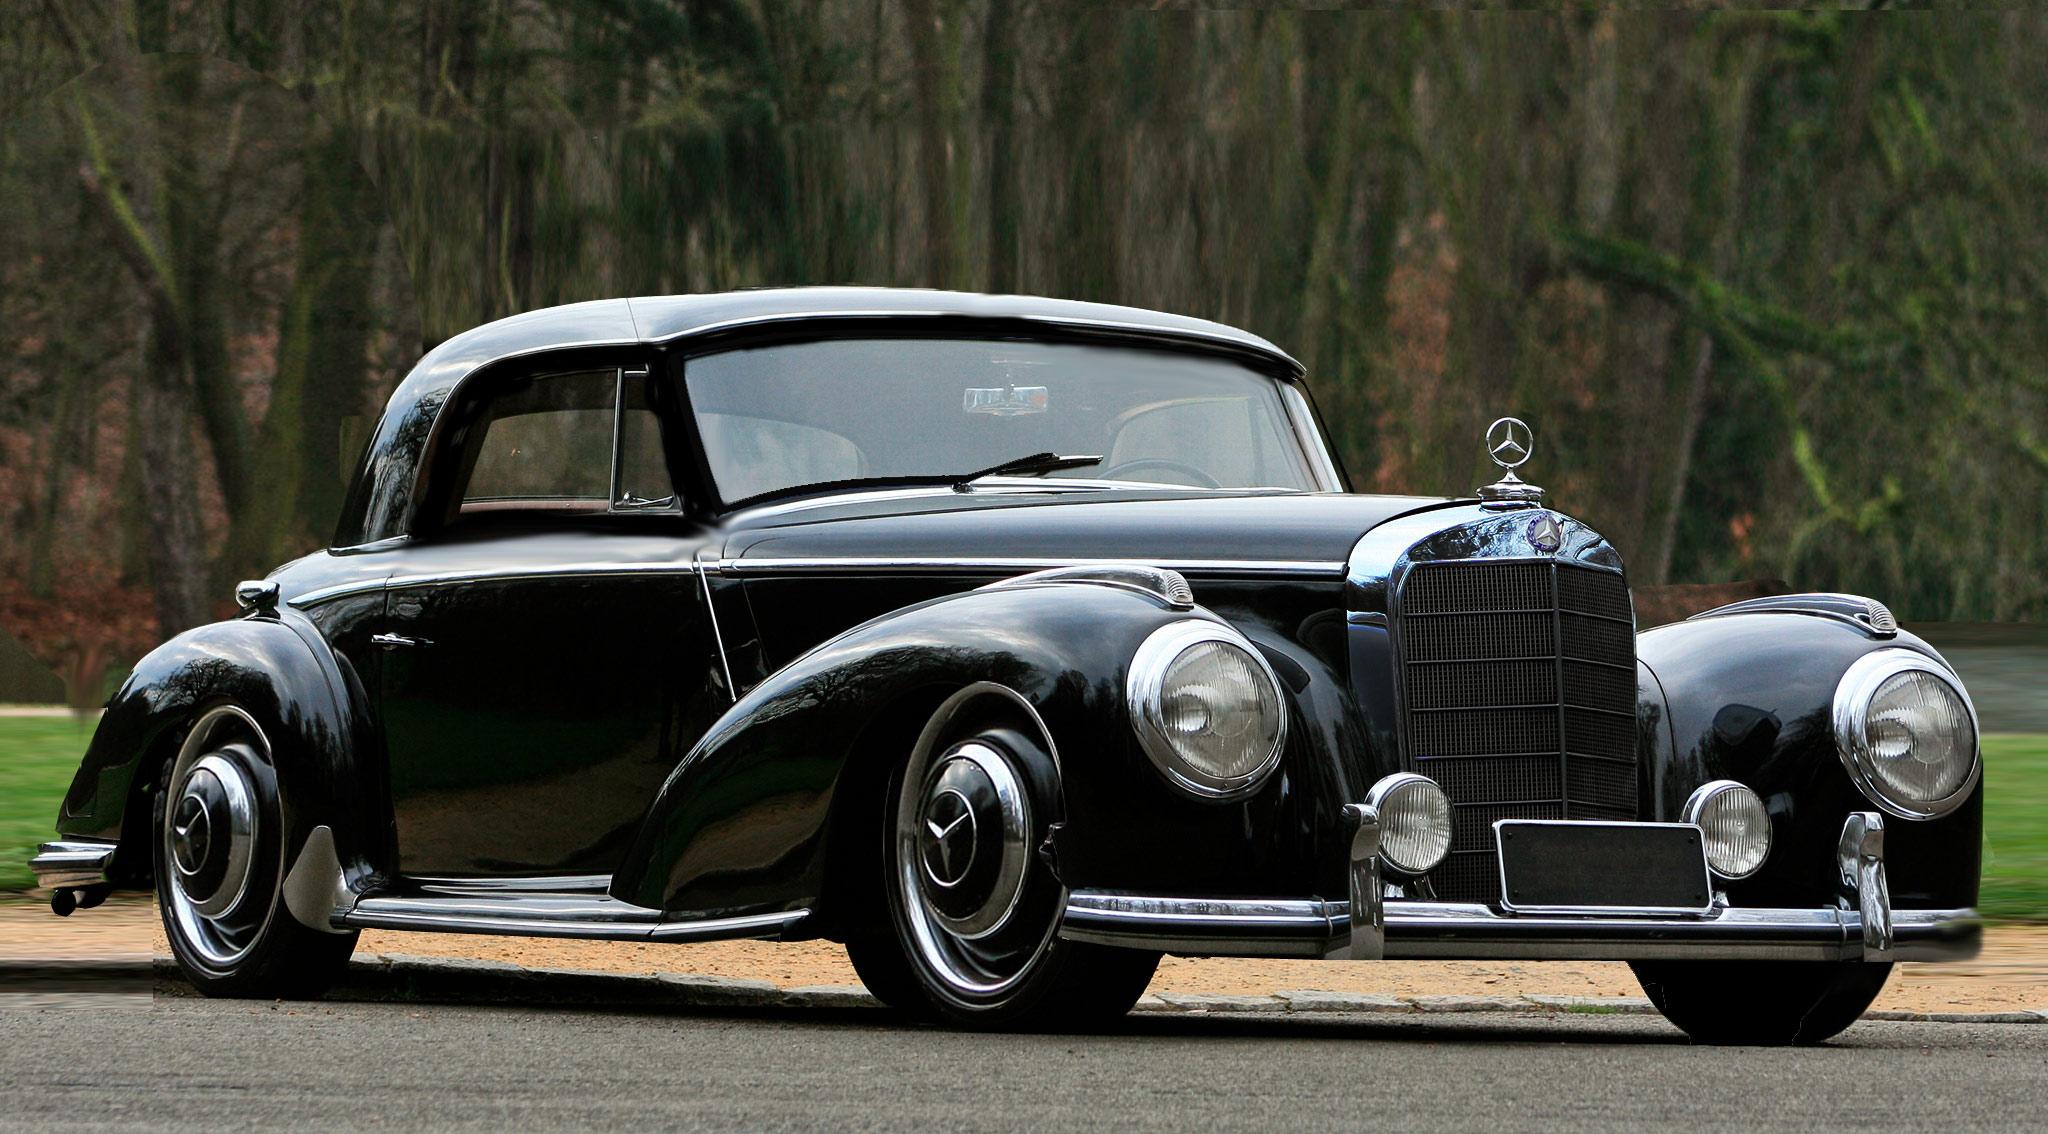 Mercedes benz sebastian motsch 300s vintage stylish cars for Mercedes benz models